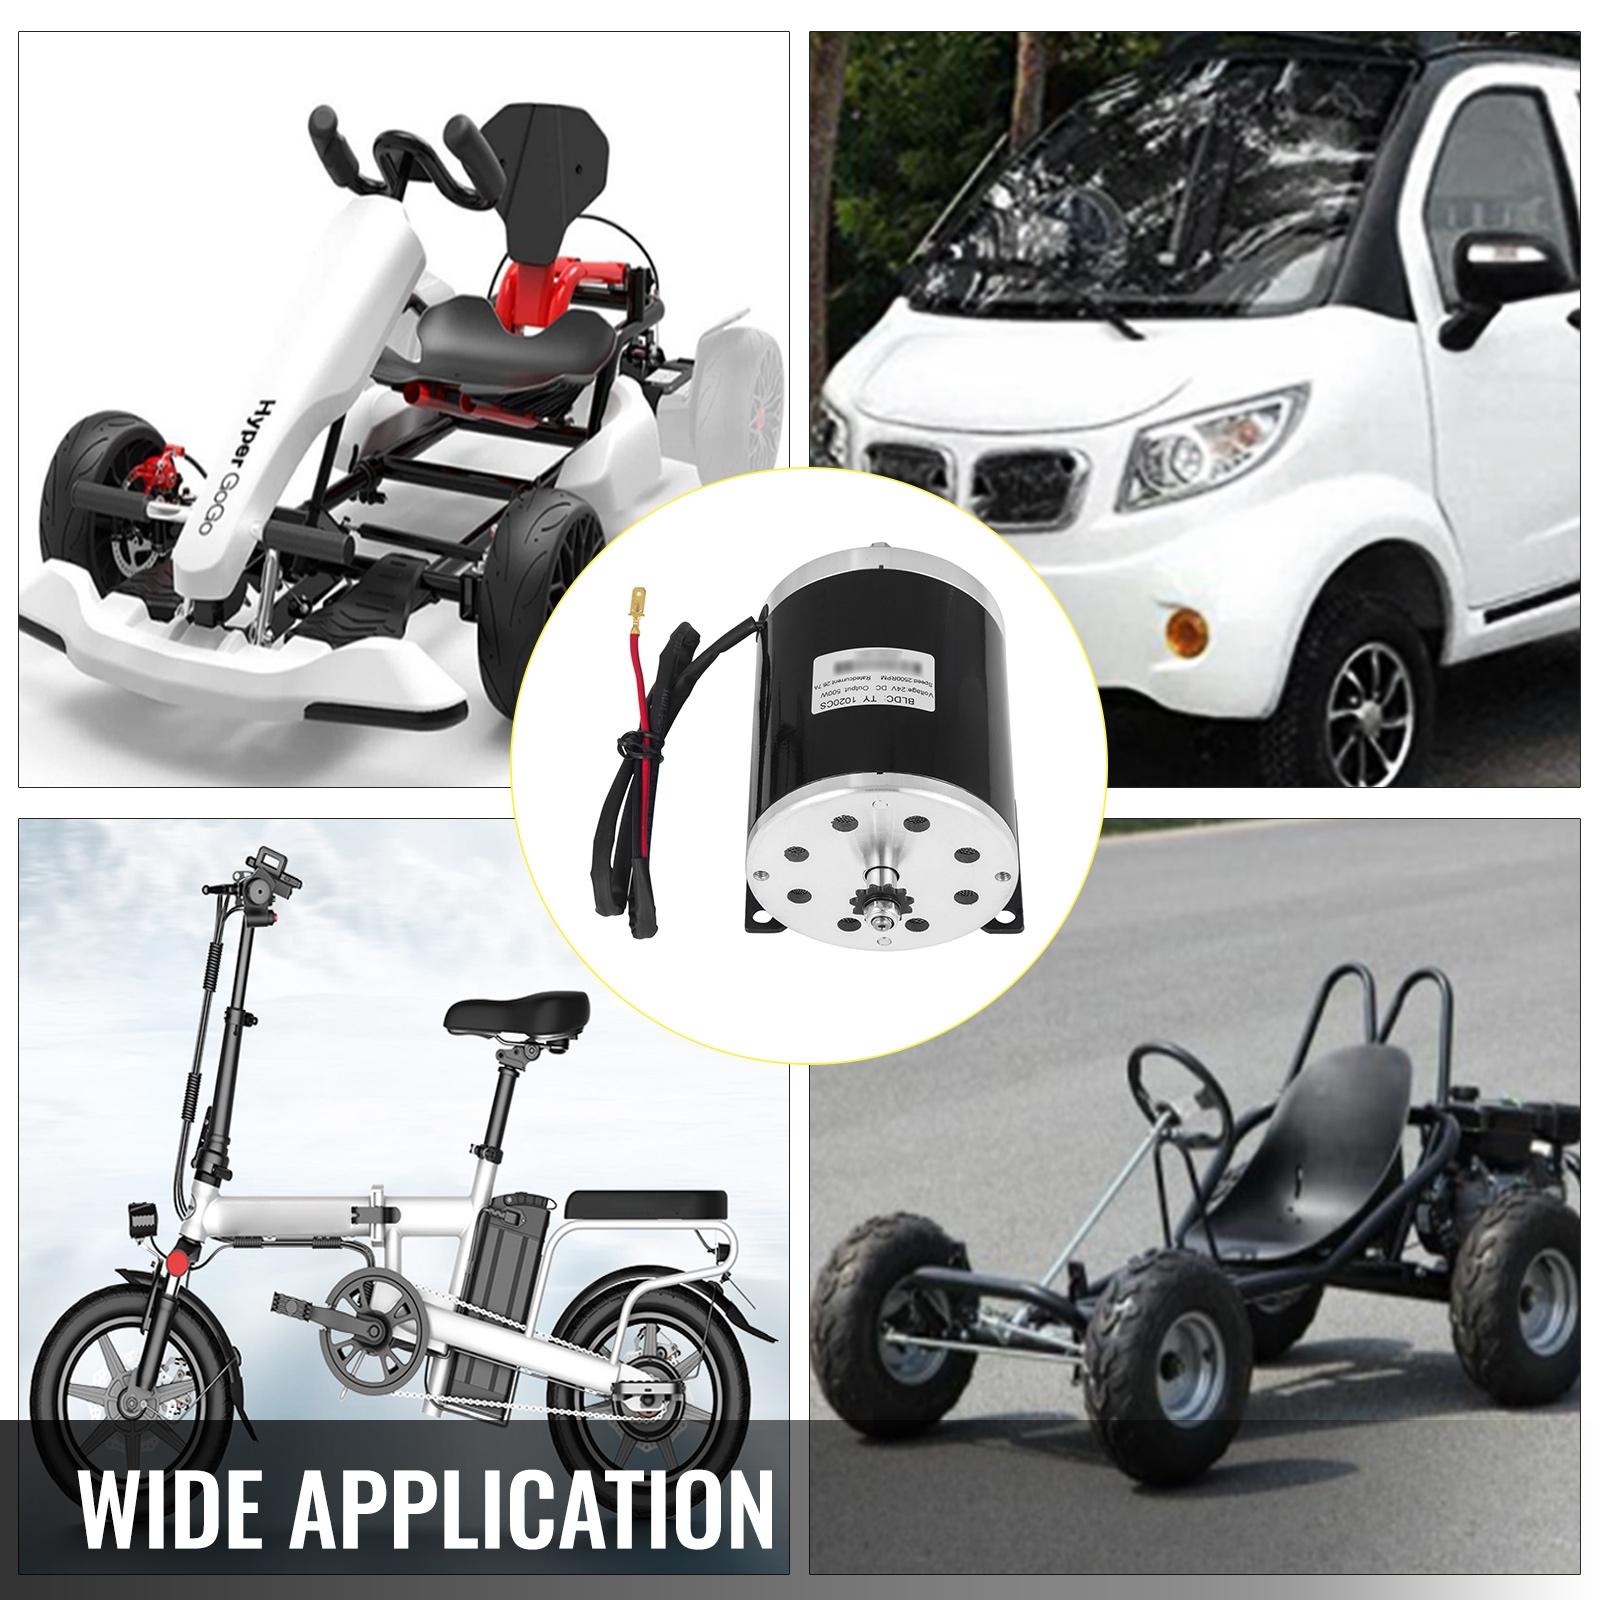 24V-500W-3500RPM-Electric-Motor-f-scooter-bike-go-kart-minibike-MY1016 thumbnail 91